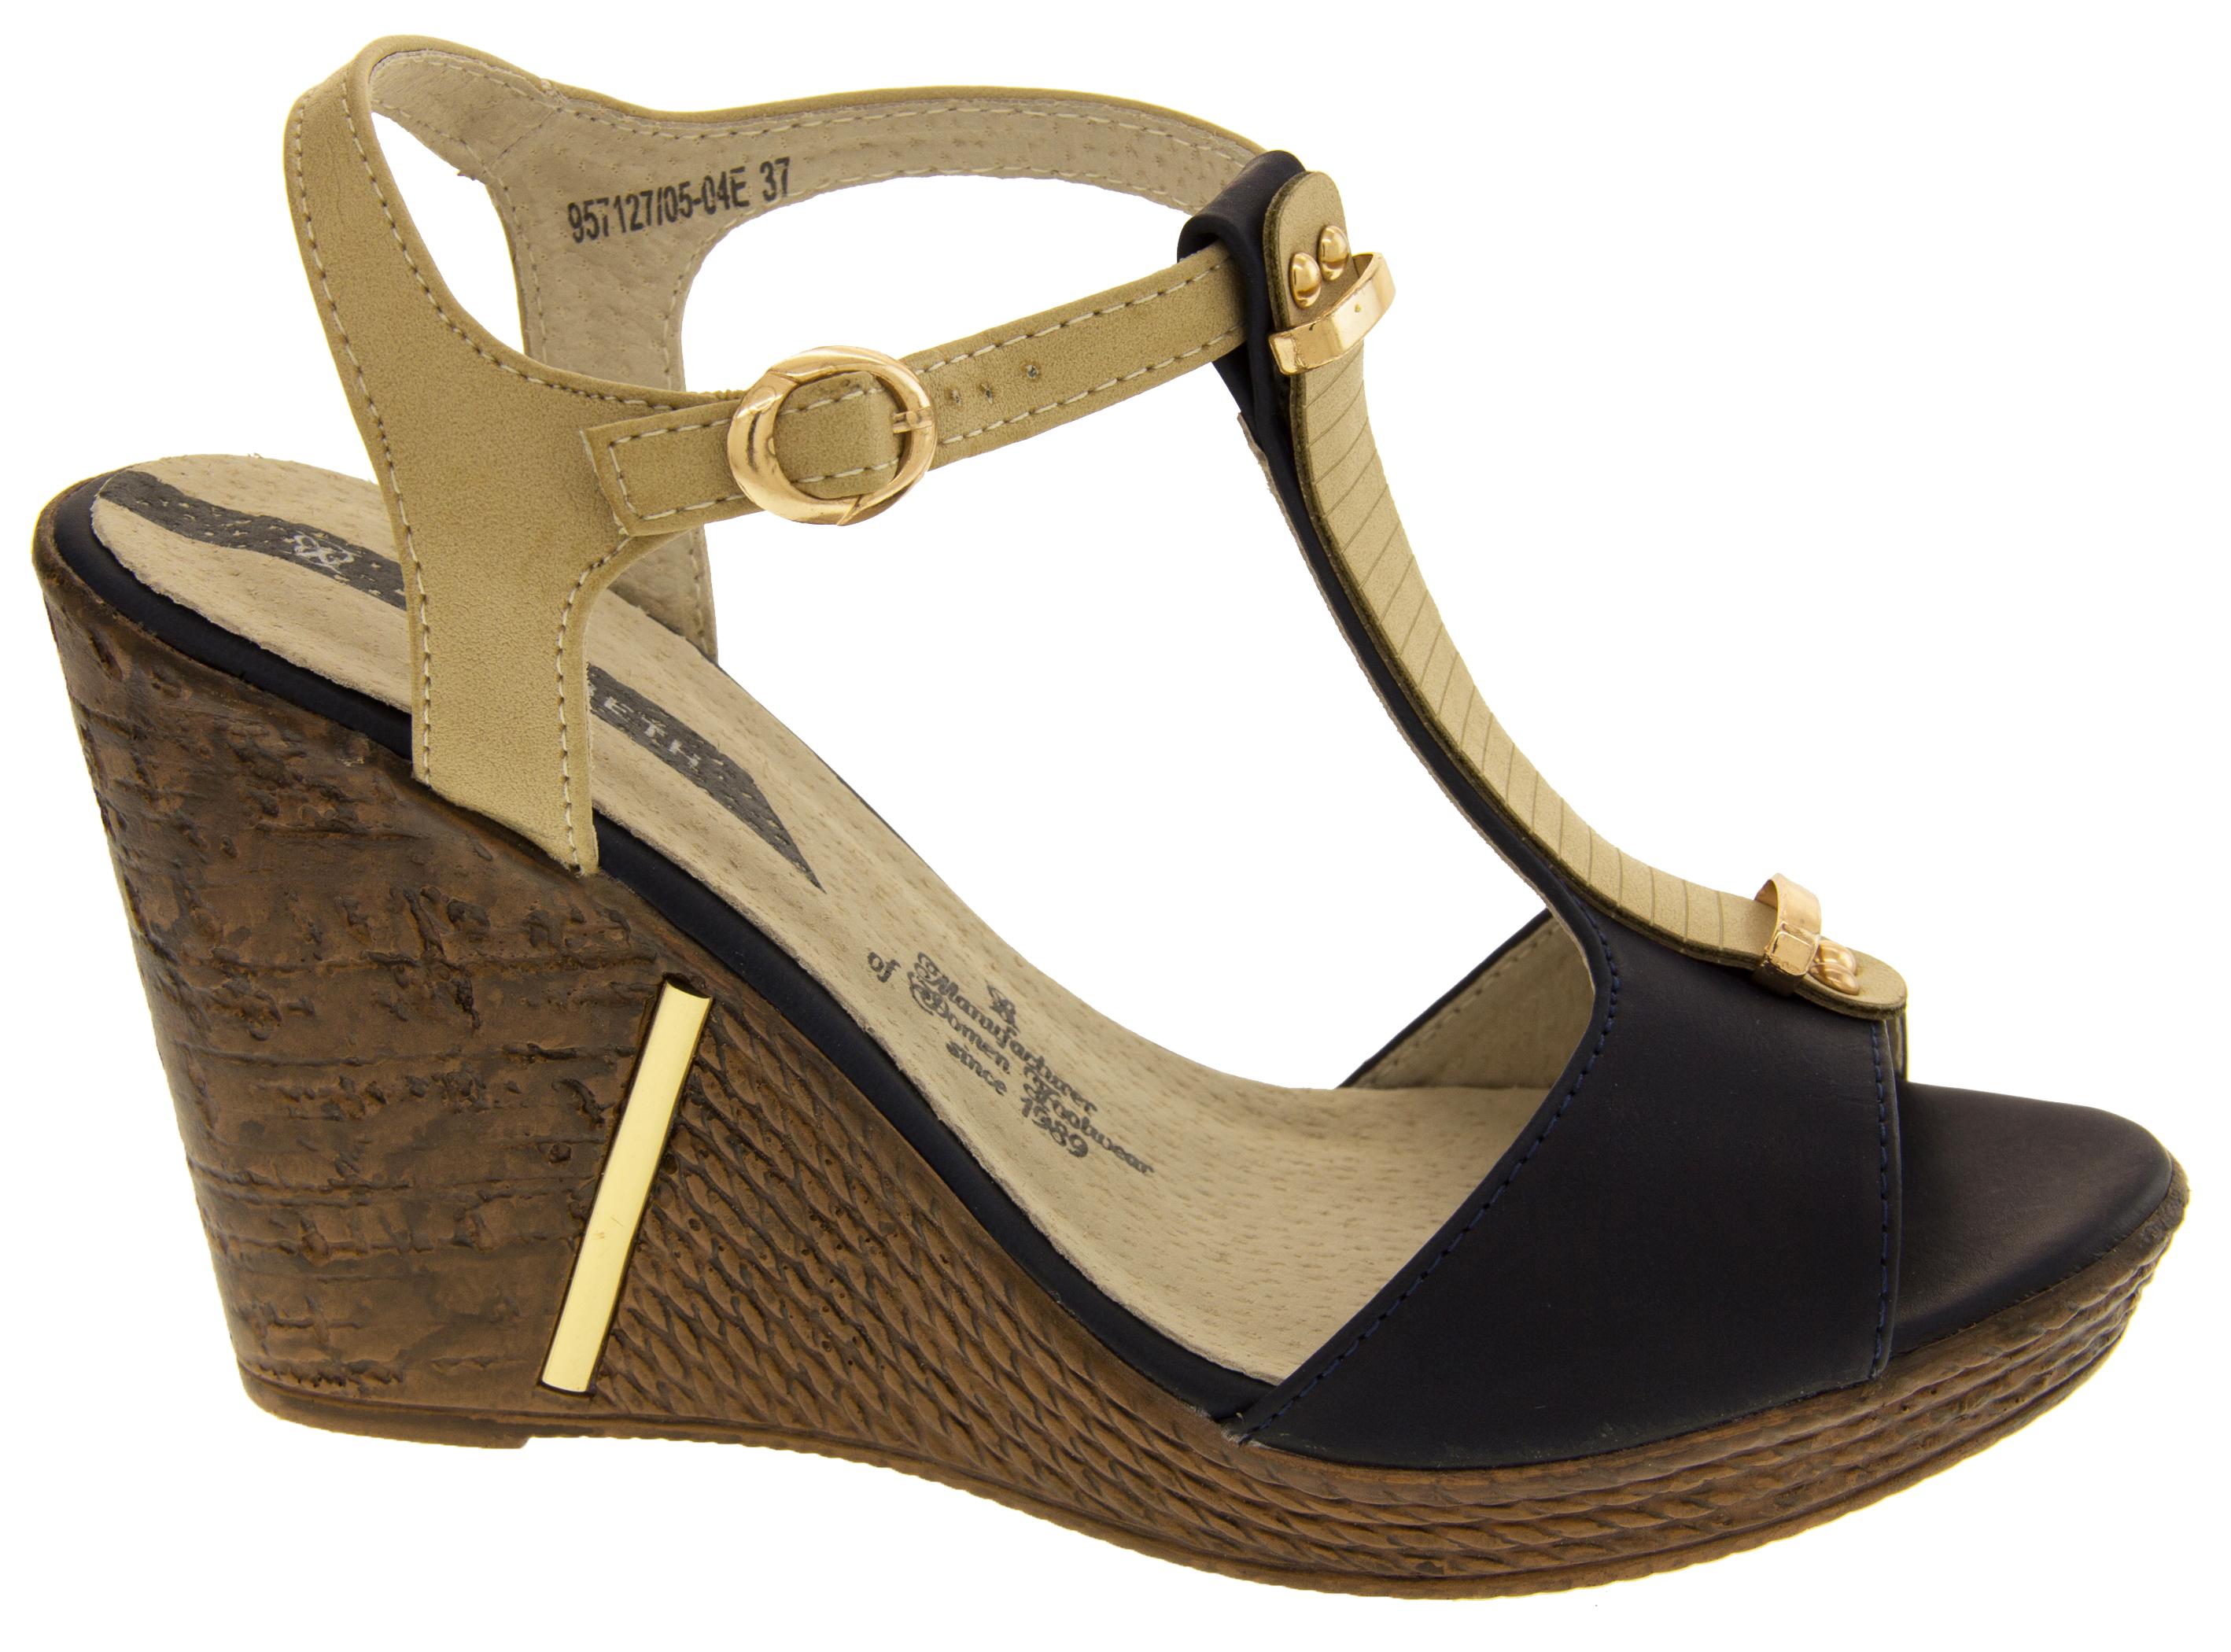 Ladies Women Platform Peep Toe Ankle Strap High Heel Shoes Sandals Size 4 5 6 7